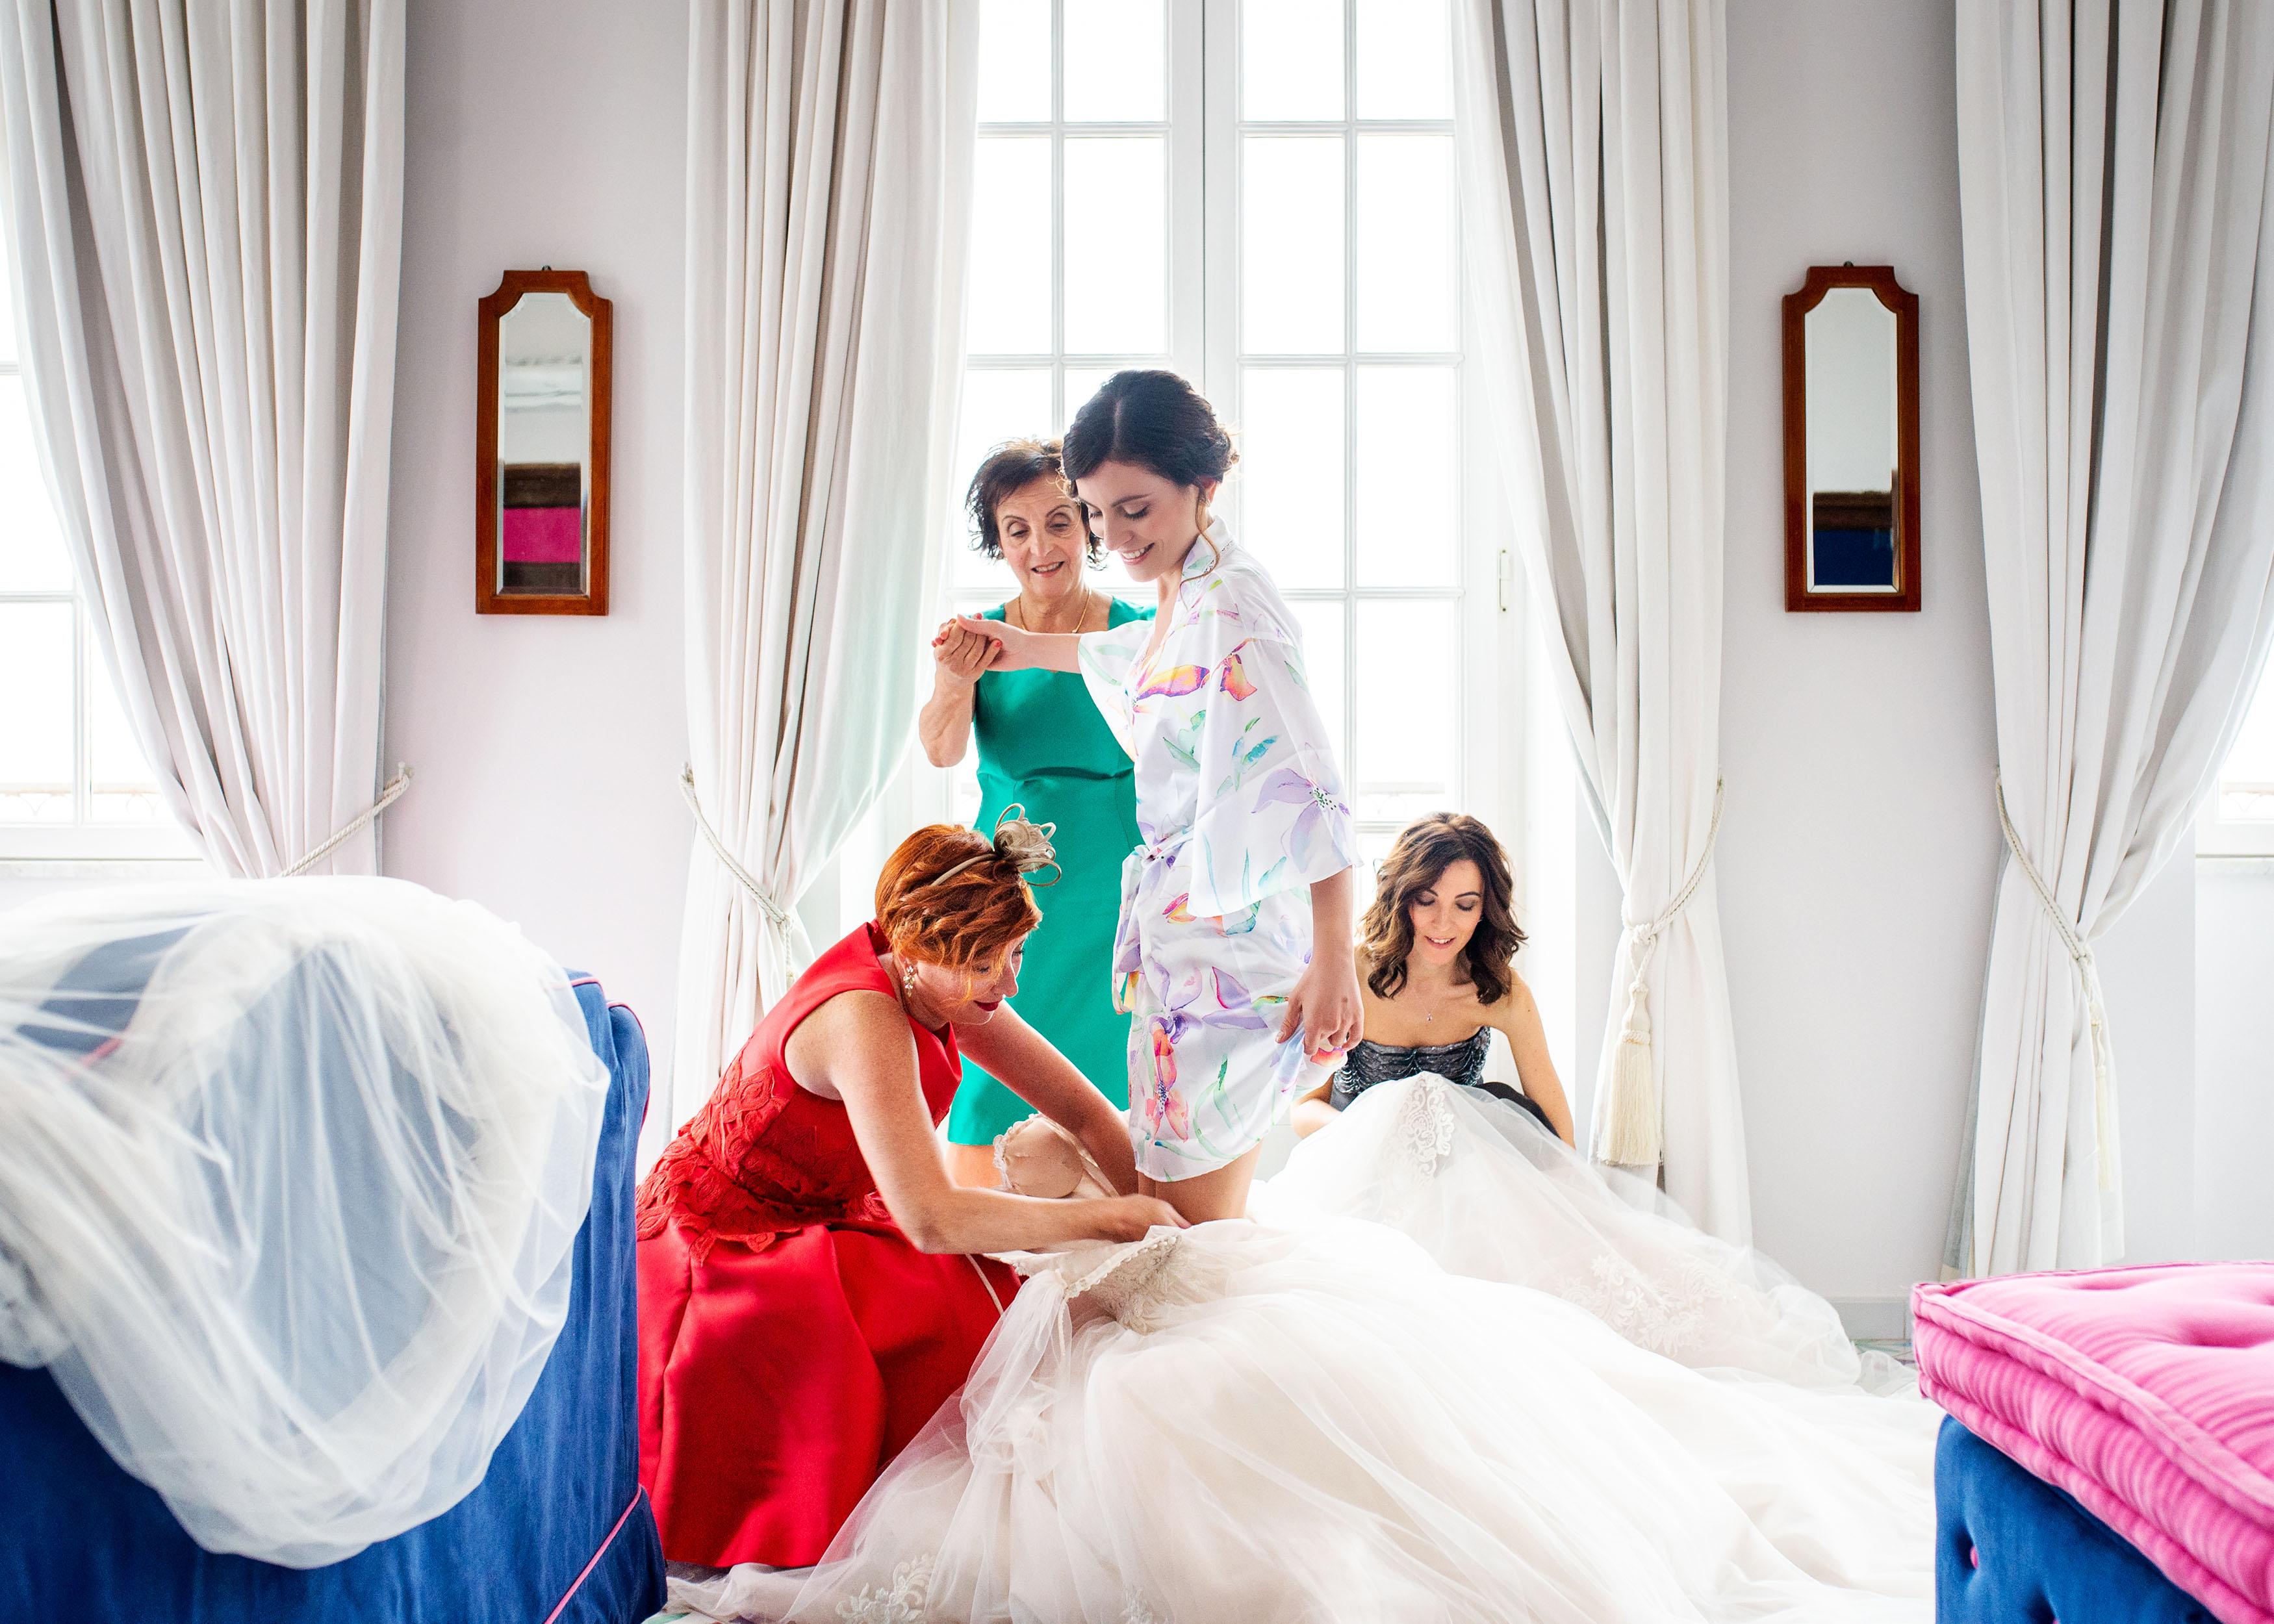 https://www.weddingamalfi.com/wp-content/uploads/Katia-Jorge-18-maggio-2019-14.jpg